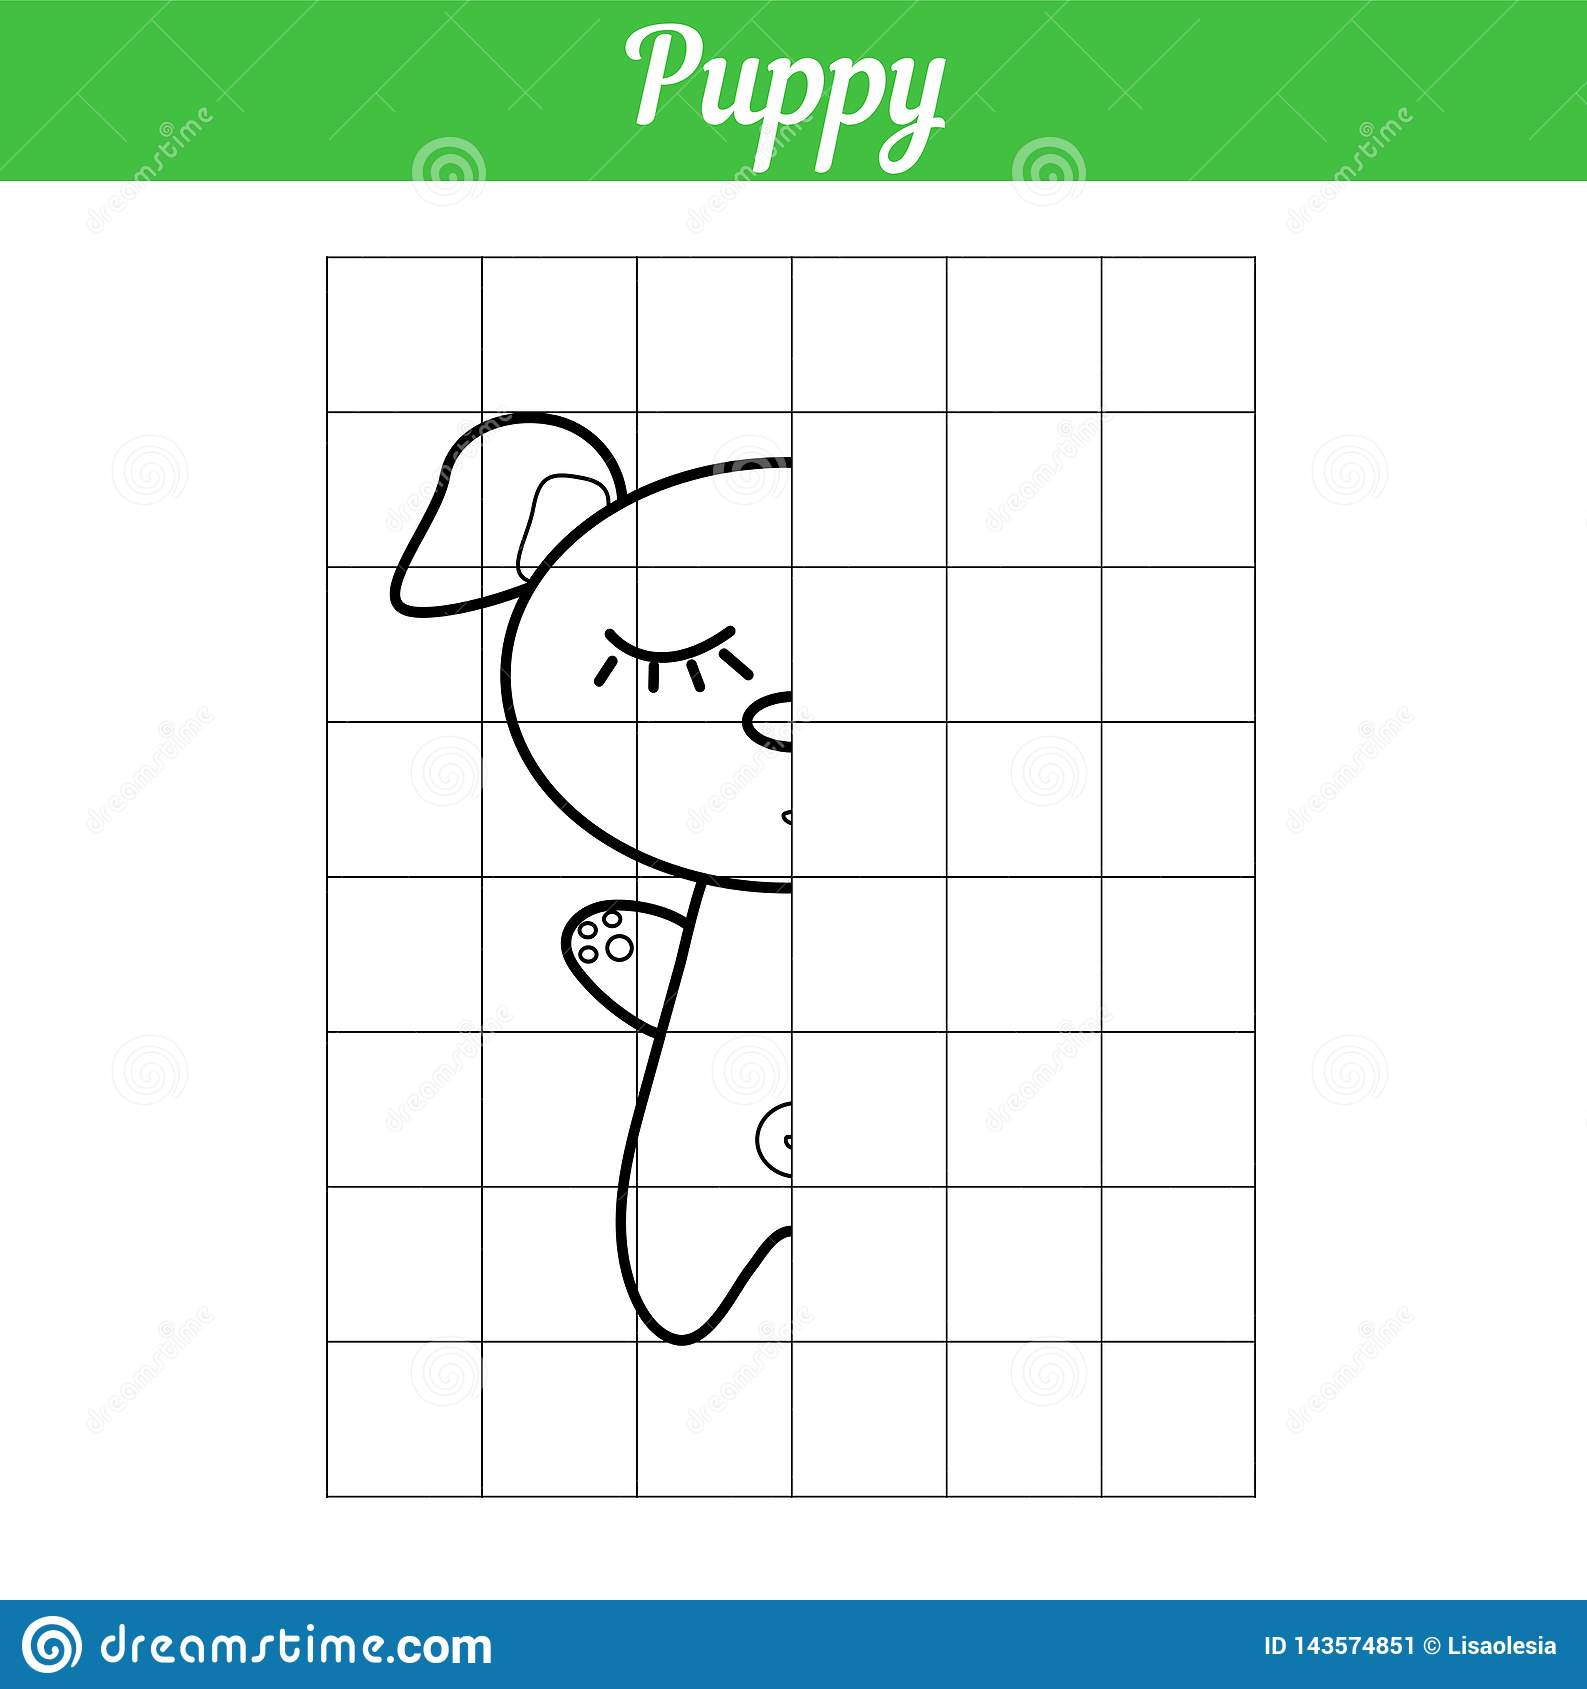 Illustration Livre Dessin Facile dedans Dessin Facile Pour Enfant